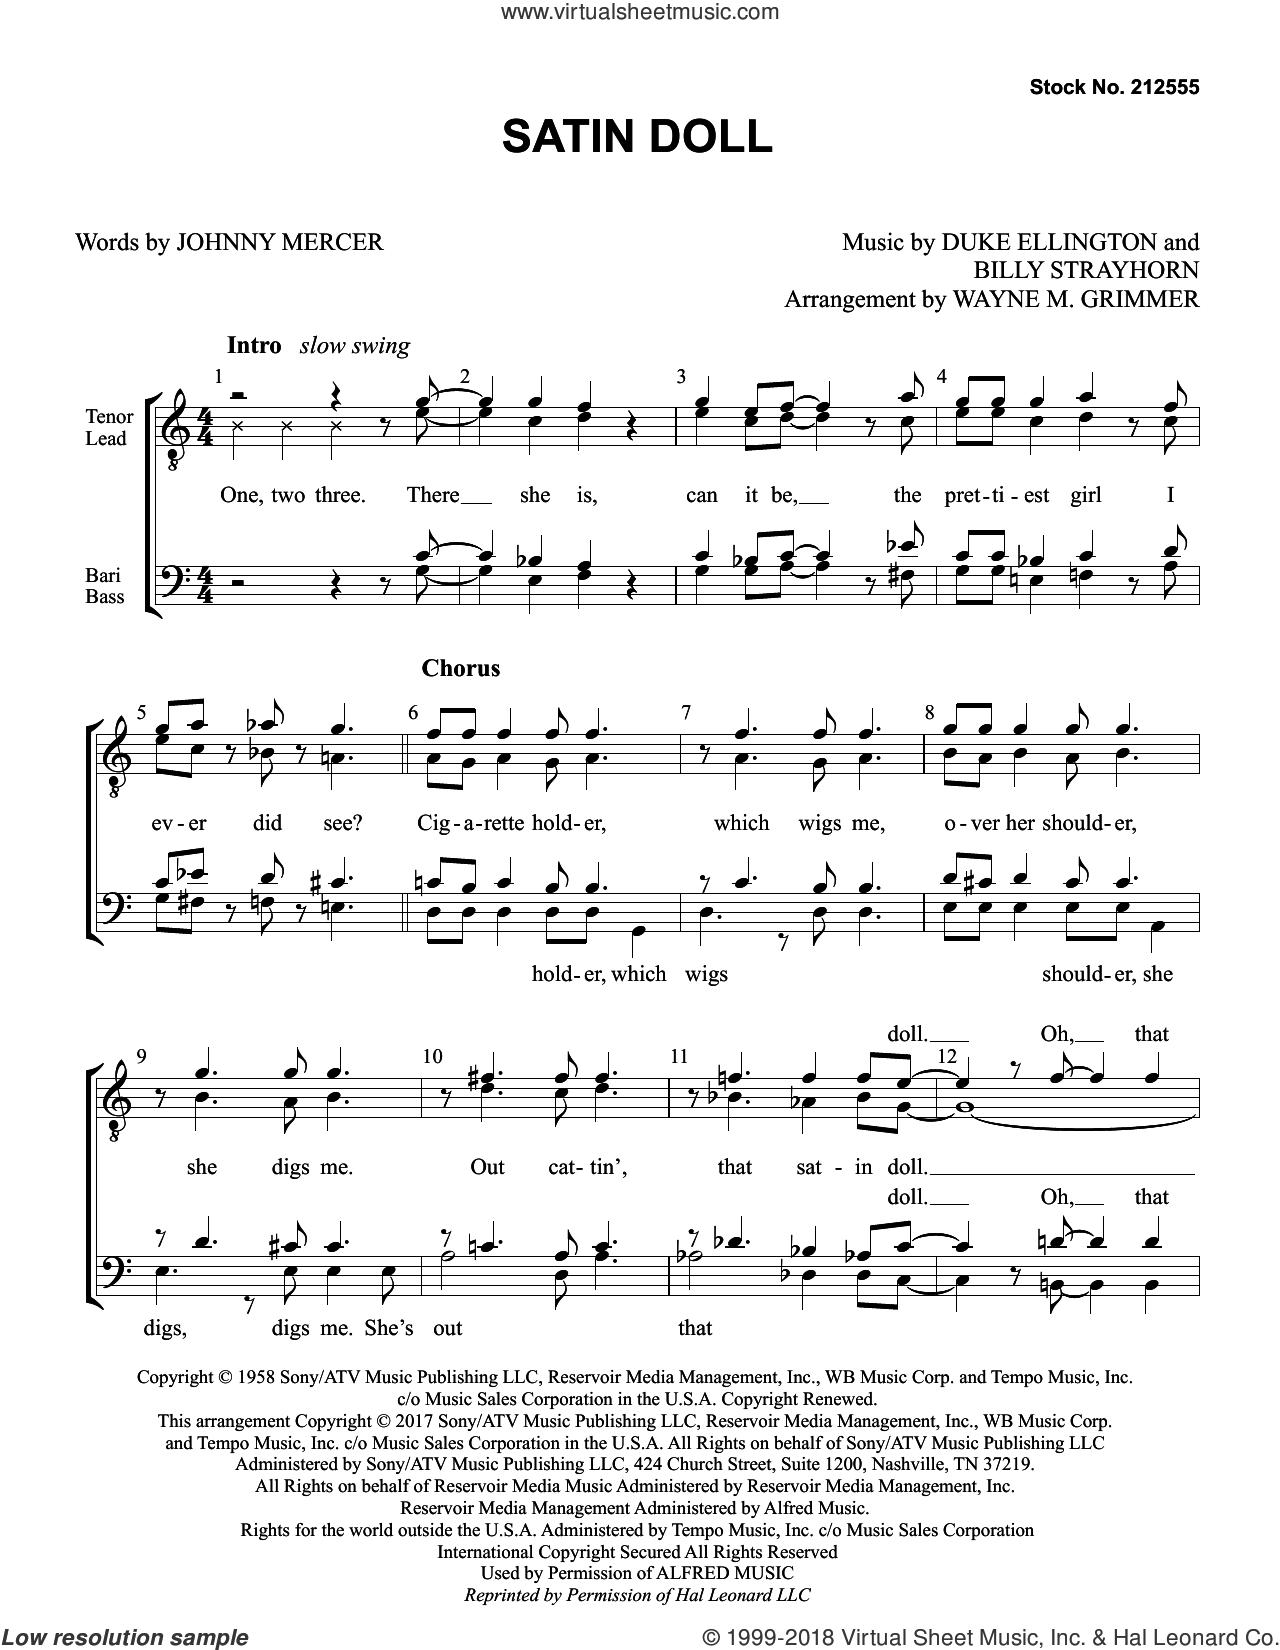 Satin Doll (arr. Wayne Grimmer) sheet music for choir (TTBB: tenor, bass) by Johnny Mercer, Wayne Grimmer, Billy Strayhorn and Duke Ellington, intermediate skill level